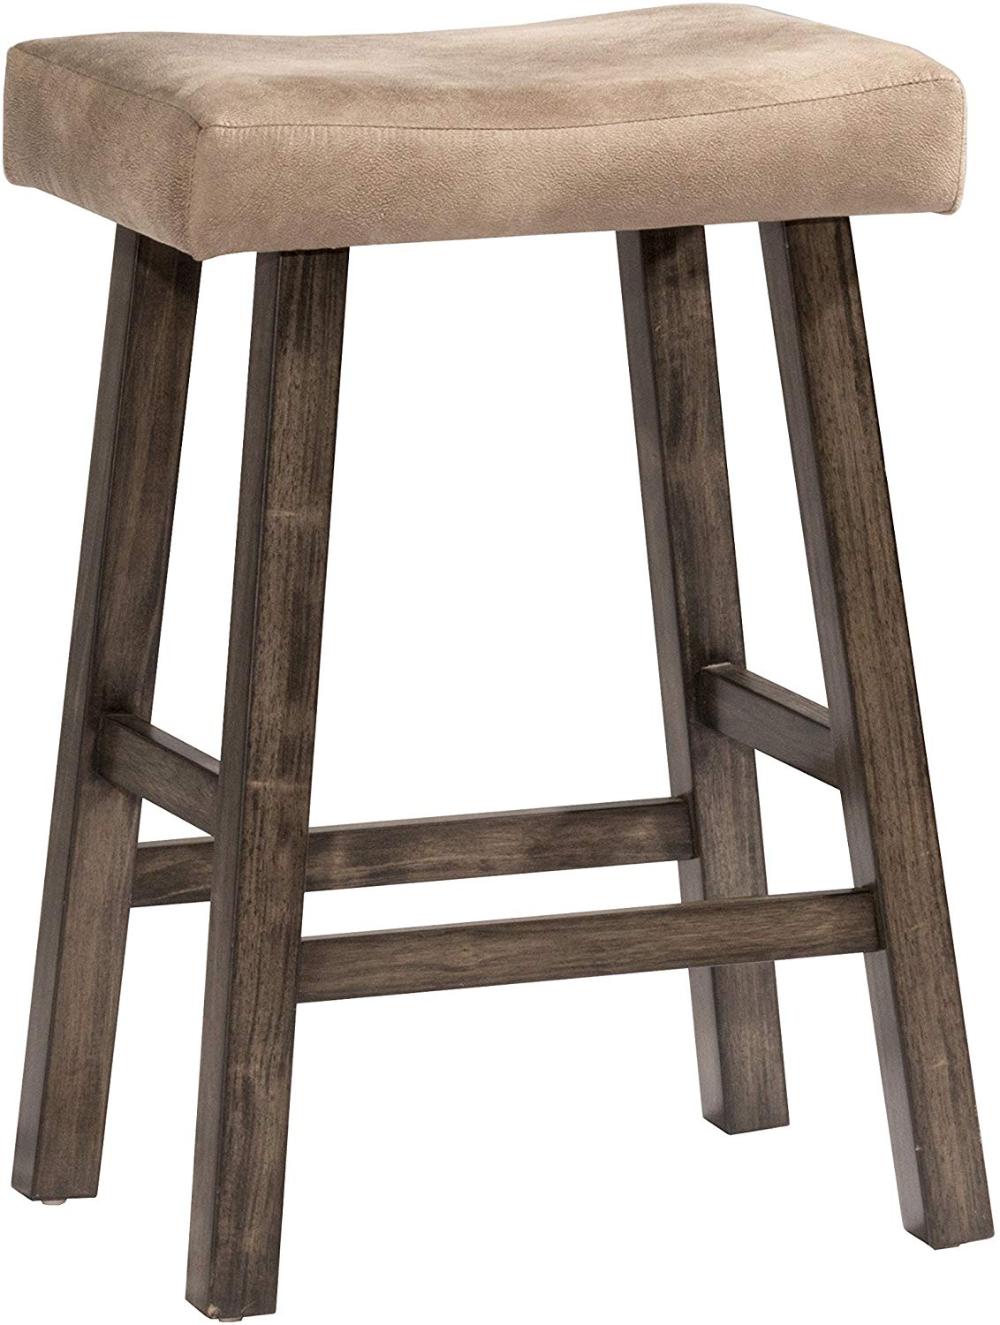 Amazon Com Hillsdale Furniture 4621 830 Saddle Backless Rustic Gray Bar Stool Kitchen Dining Bar Stools Grey Bar Stools Stool